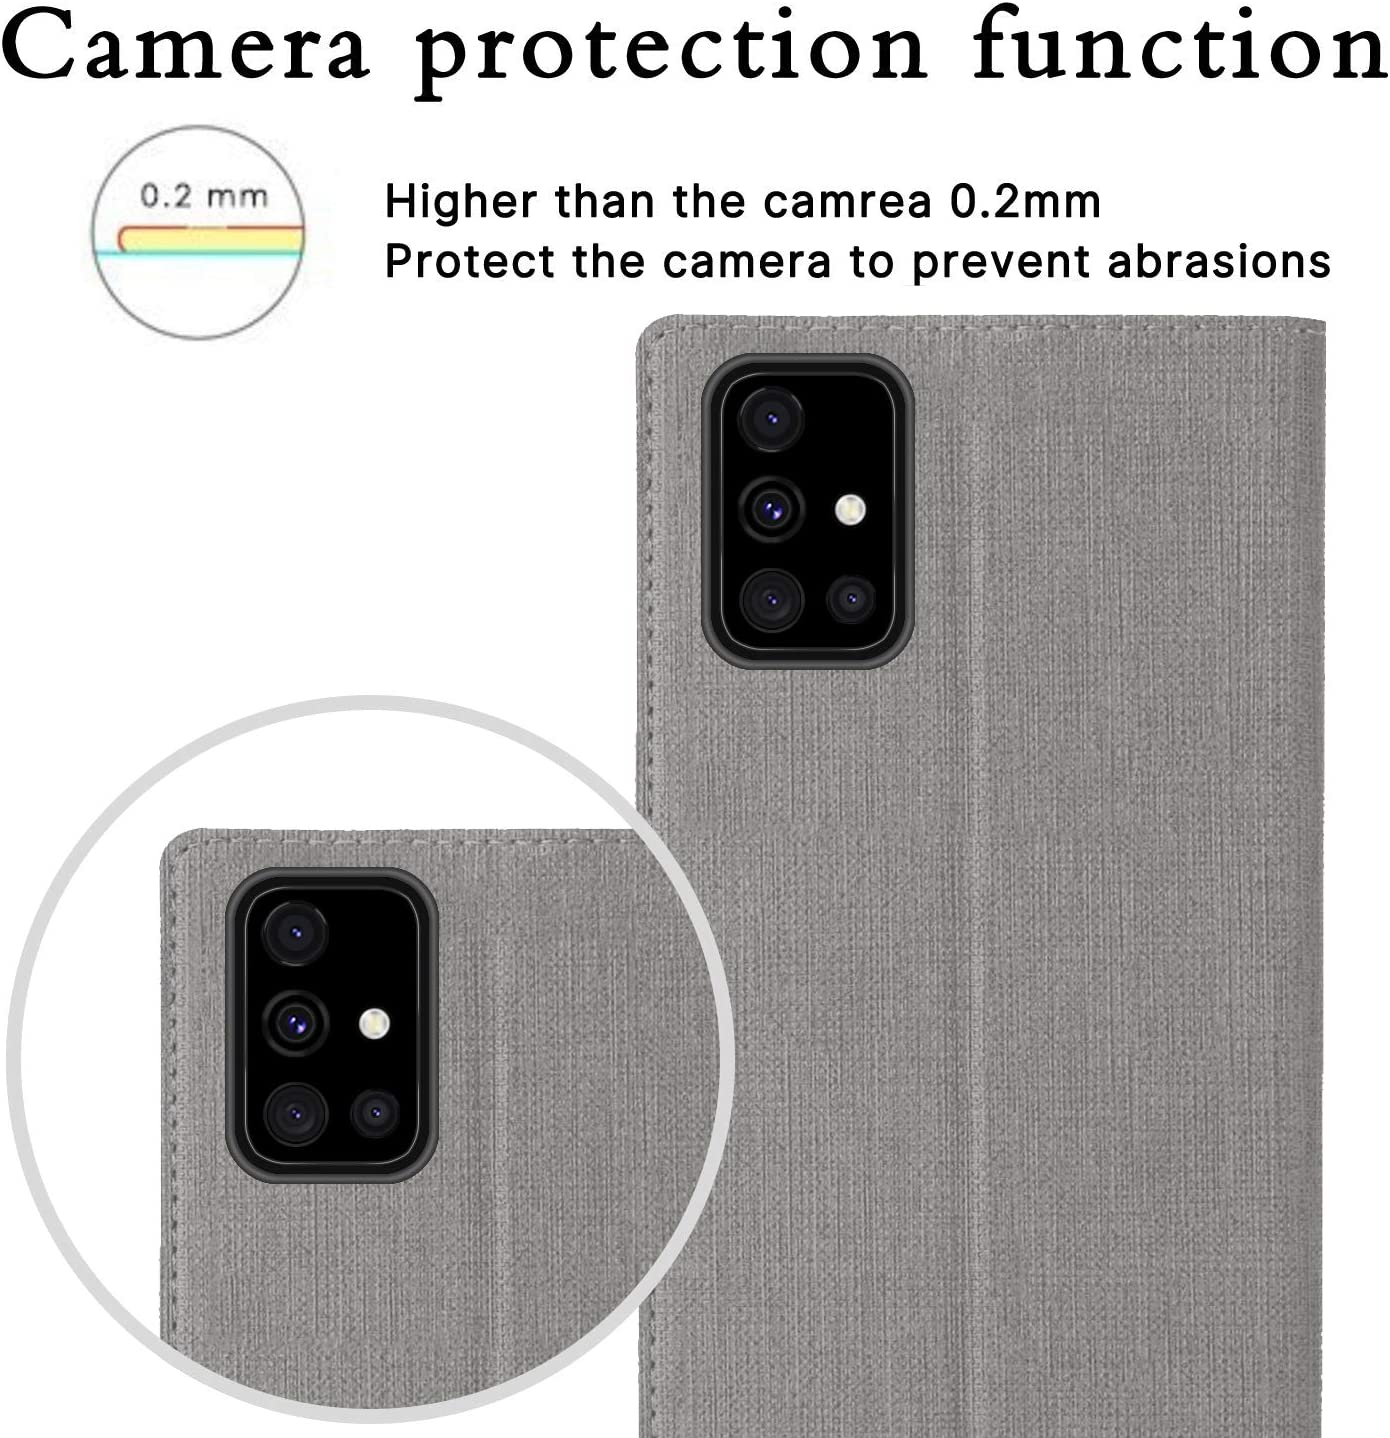 HATA Samsung A51 Lederh/ülle Handyh/ülle klapph/ülle mit Standfunktion Magnetverschlu/ß Kartenfach Samsung A51 Schutzh/ülle Tasche A51, Black